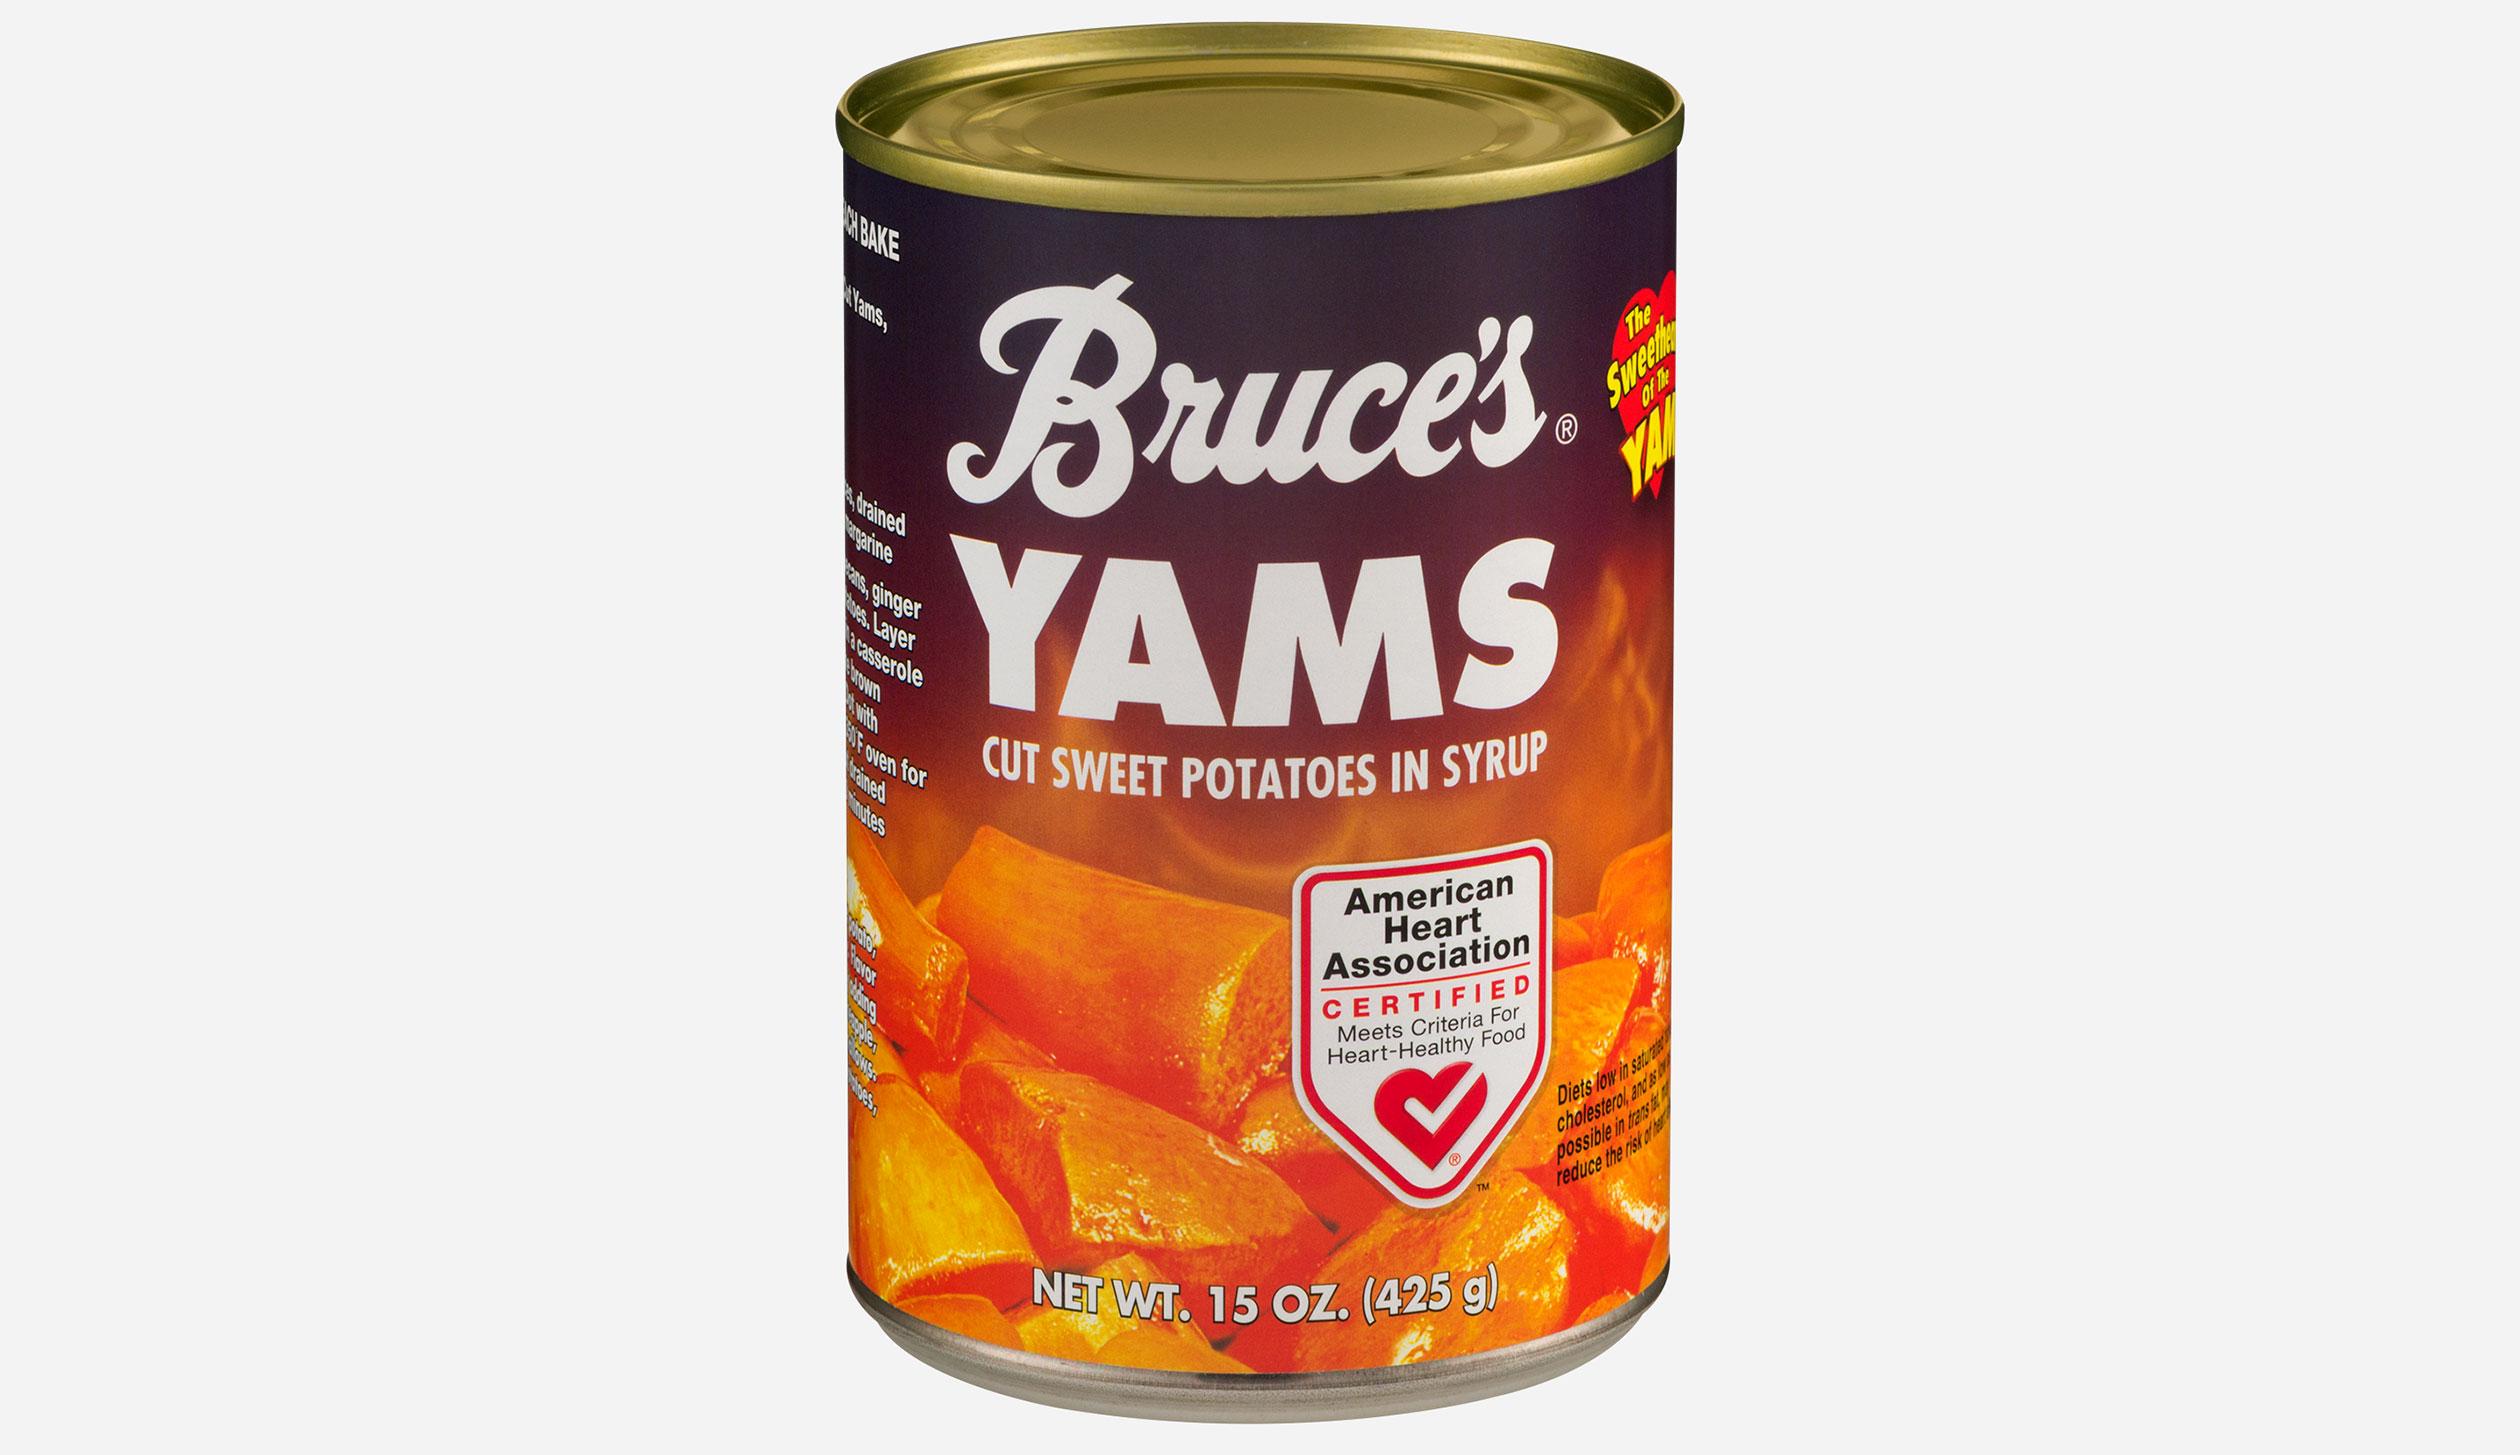 15_oz-Bruce's-Cut-Sweet-Potato